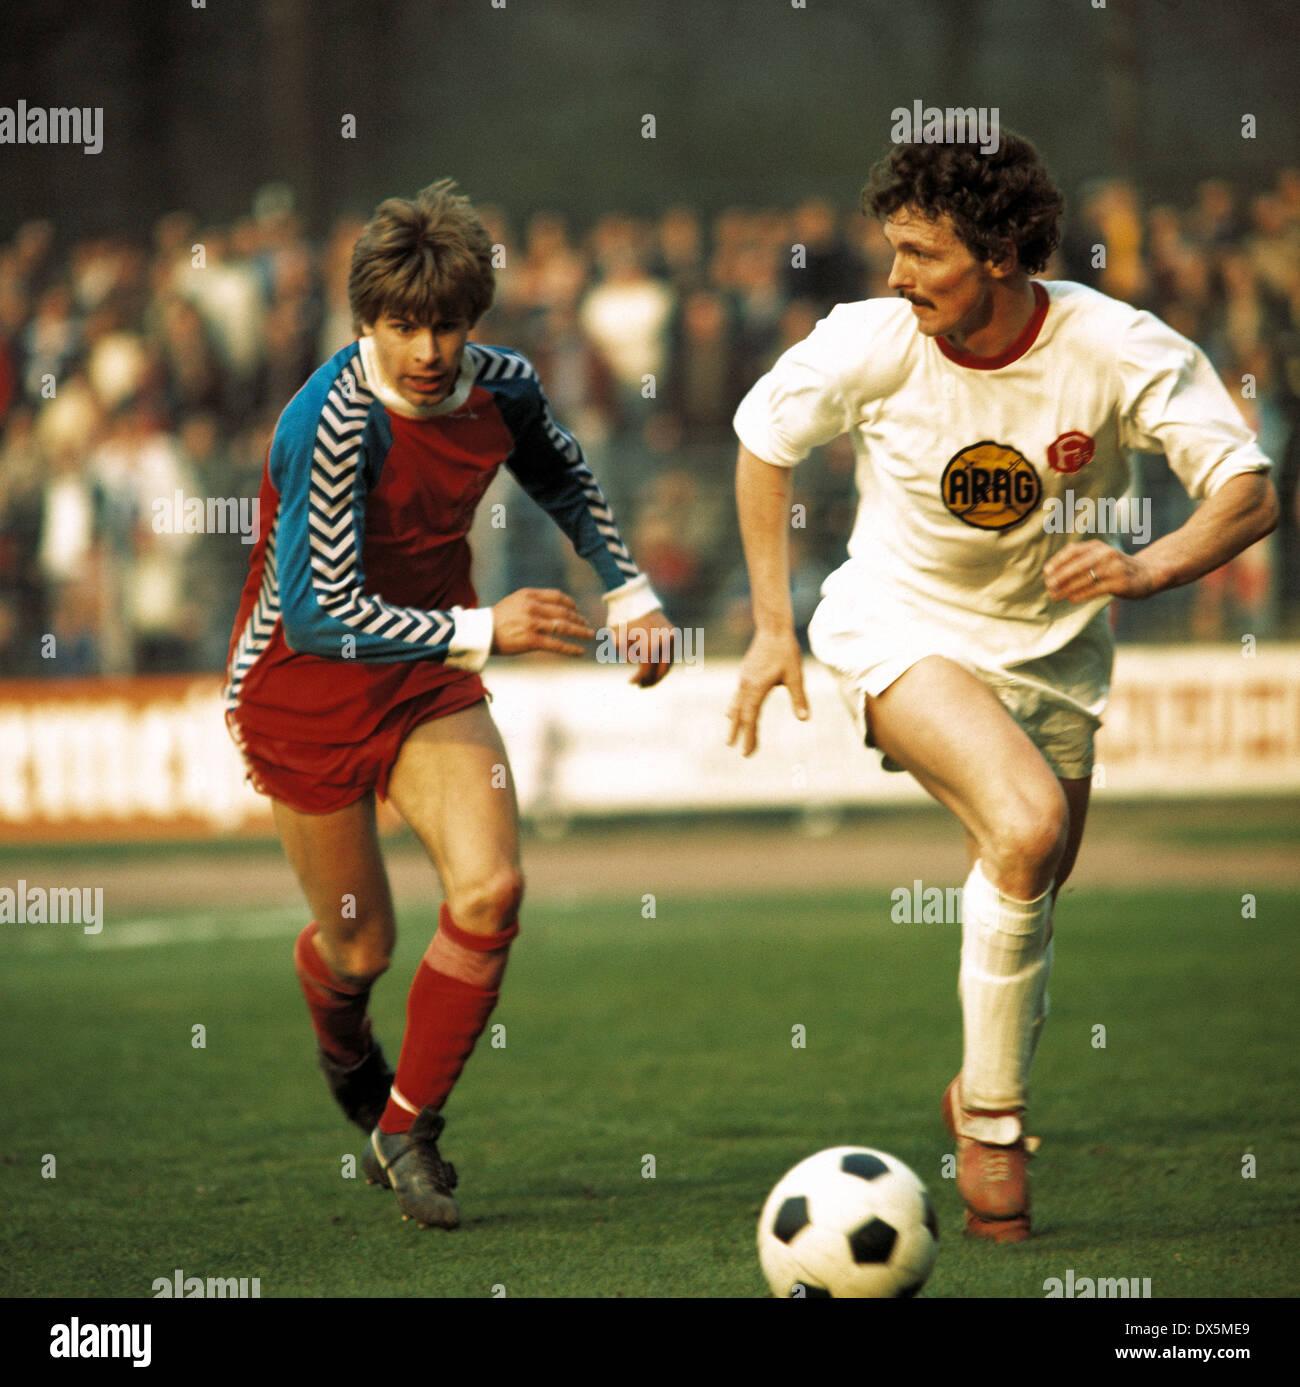 football, Bundesliga, 1975/1976, Grotenburg Stadium, FC Bayer 05 Uerdingen versus Fortuna Duesseldorf 2:0,scene of the match, Norbert Brinkmann (05) left and Gerd Zimmermann (Fortuna) - Stock Image